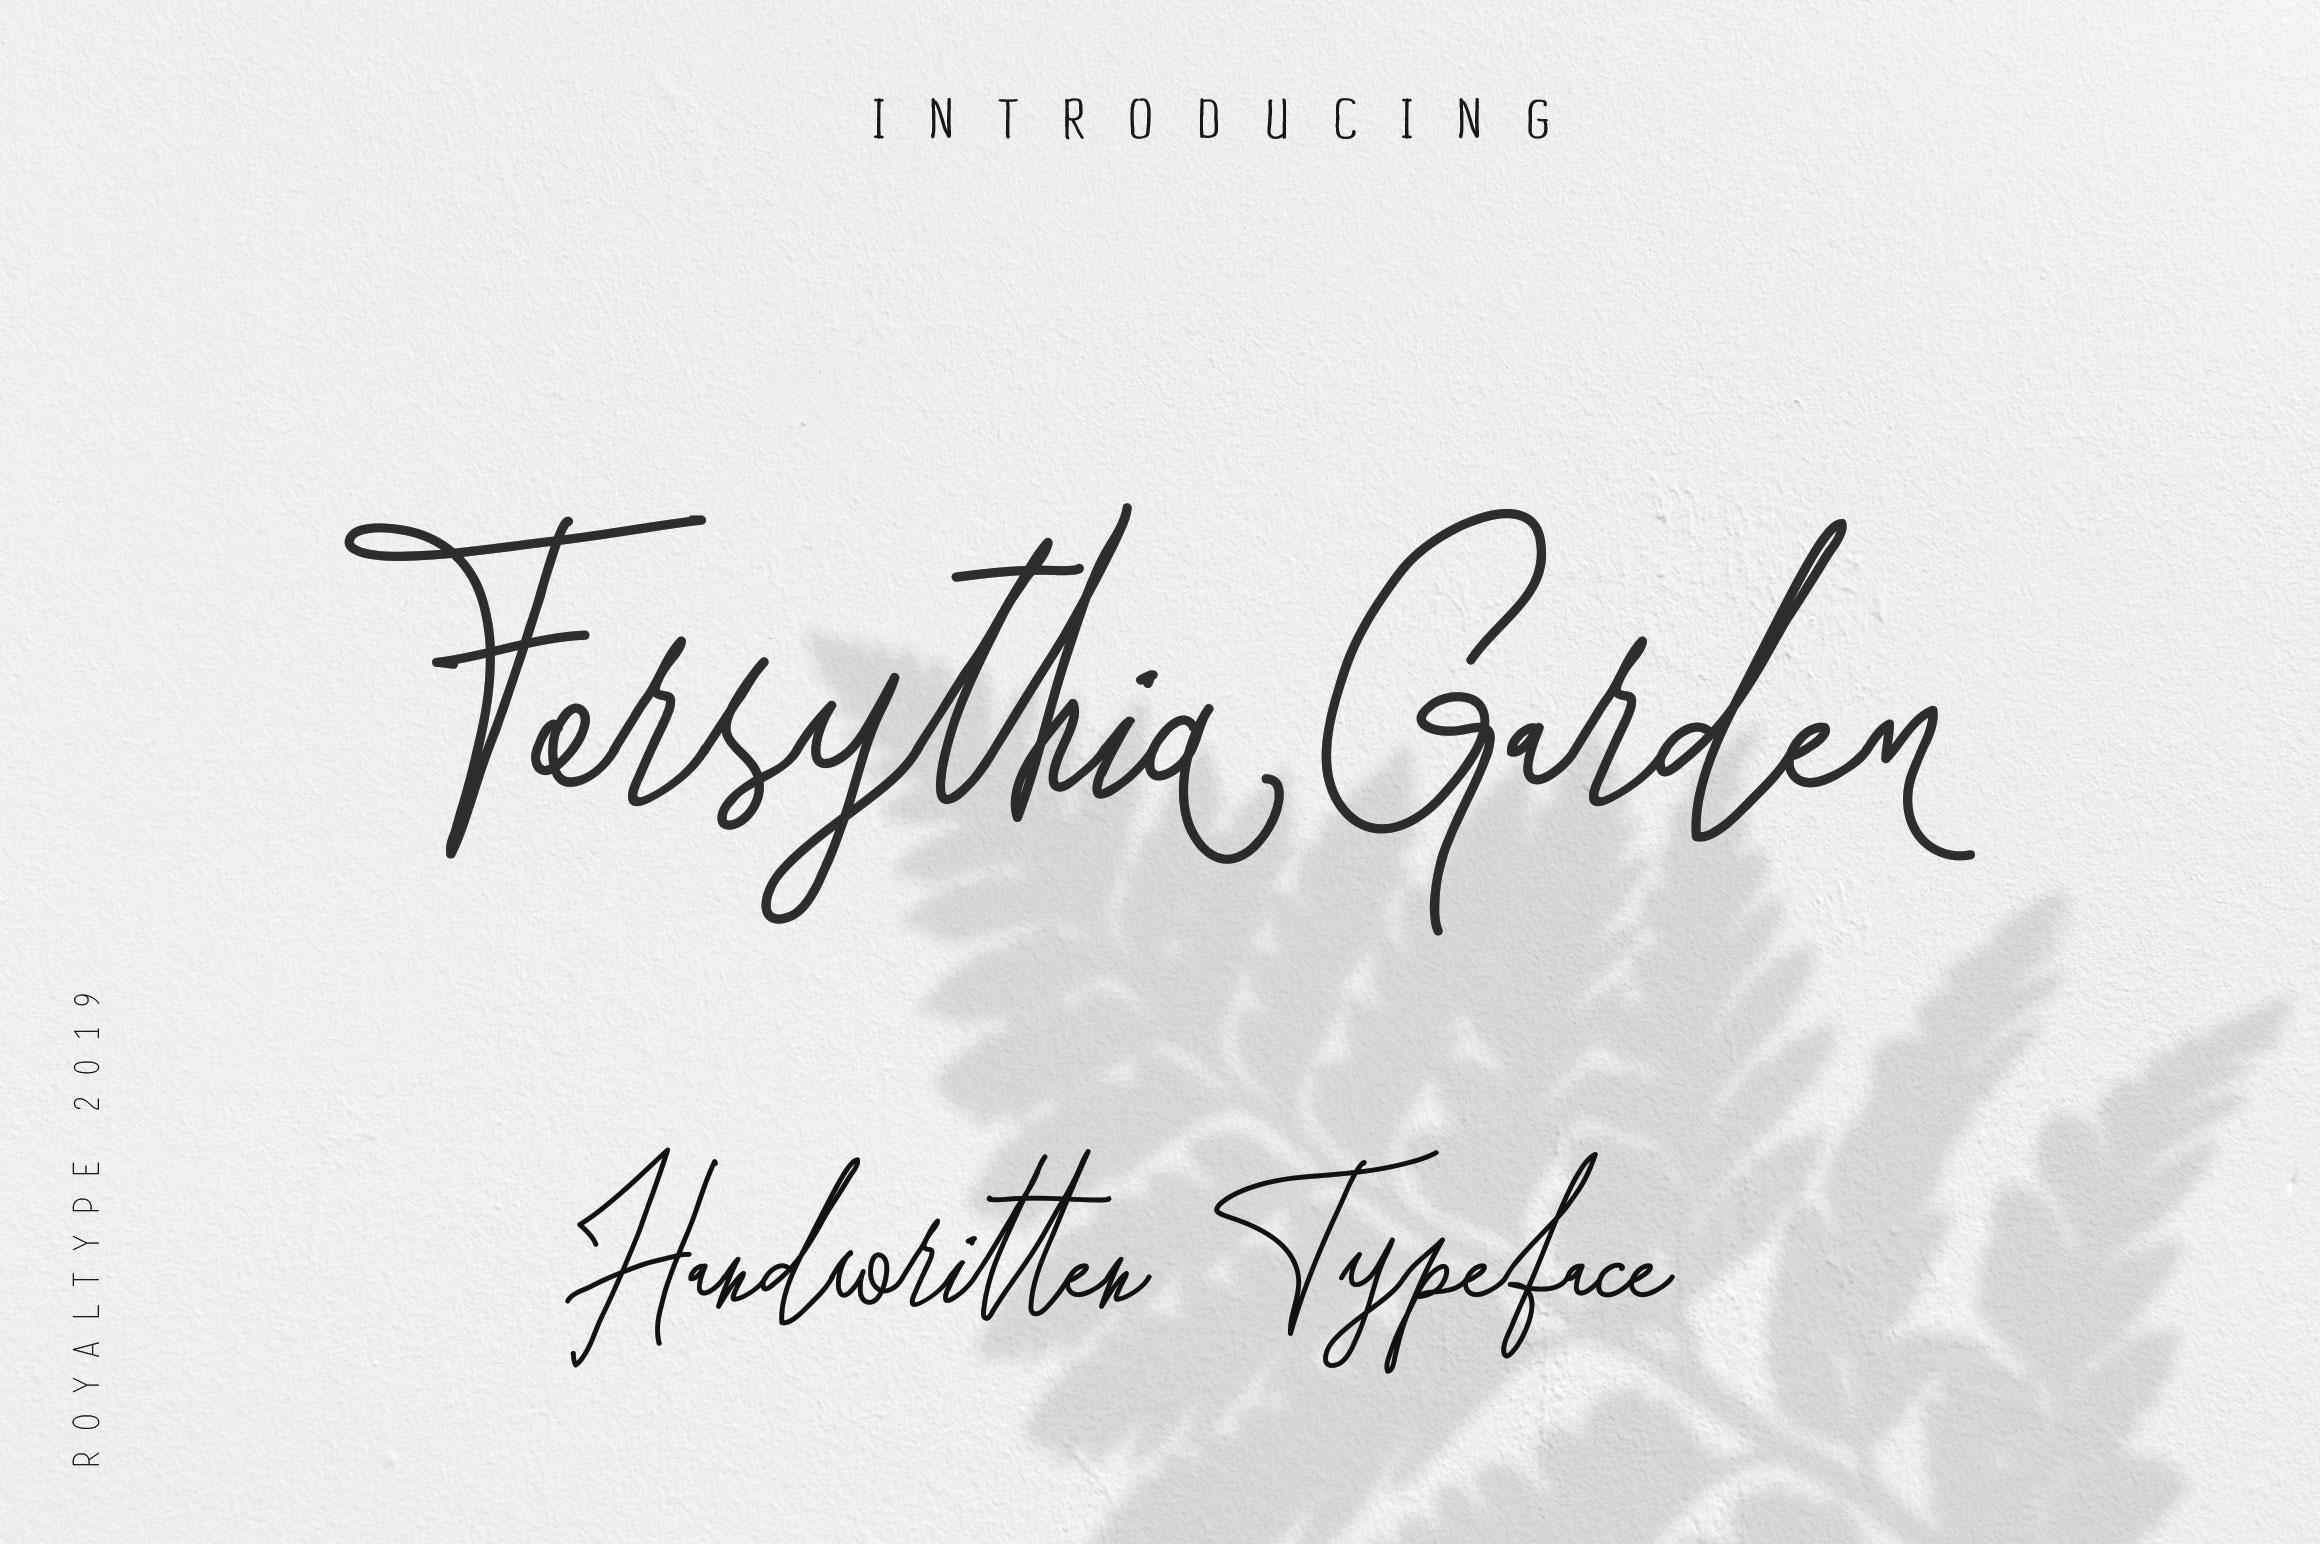 Forsythia Garden |Signature Typeface example image 1